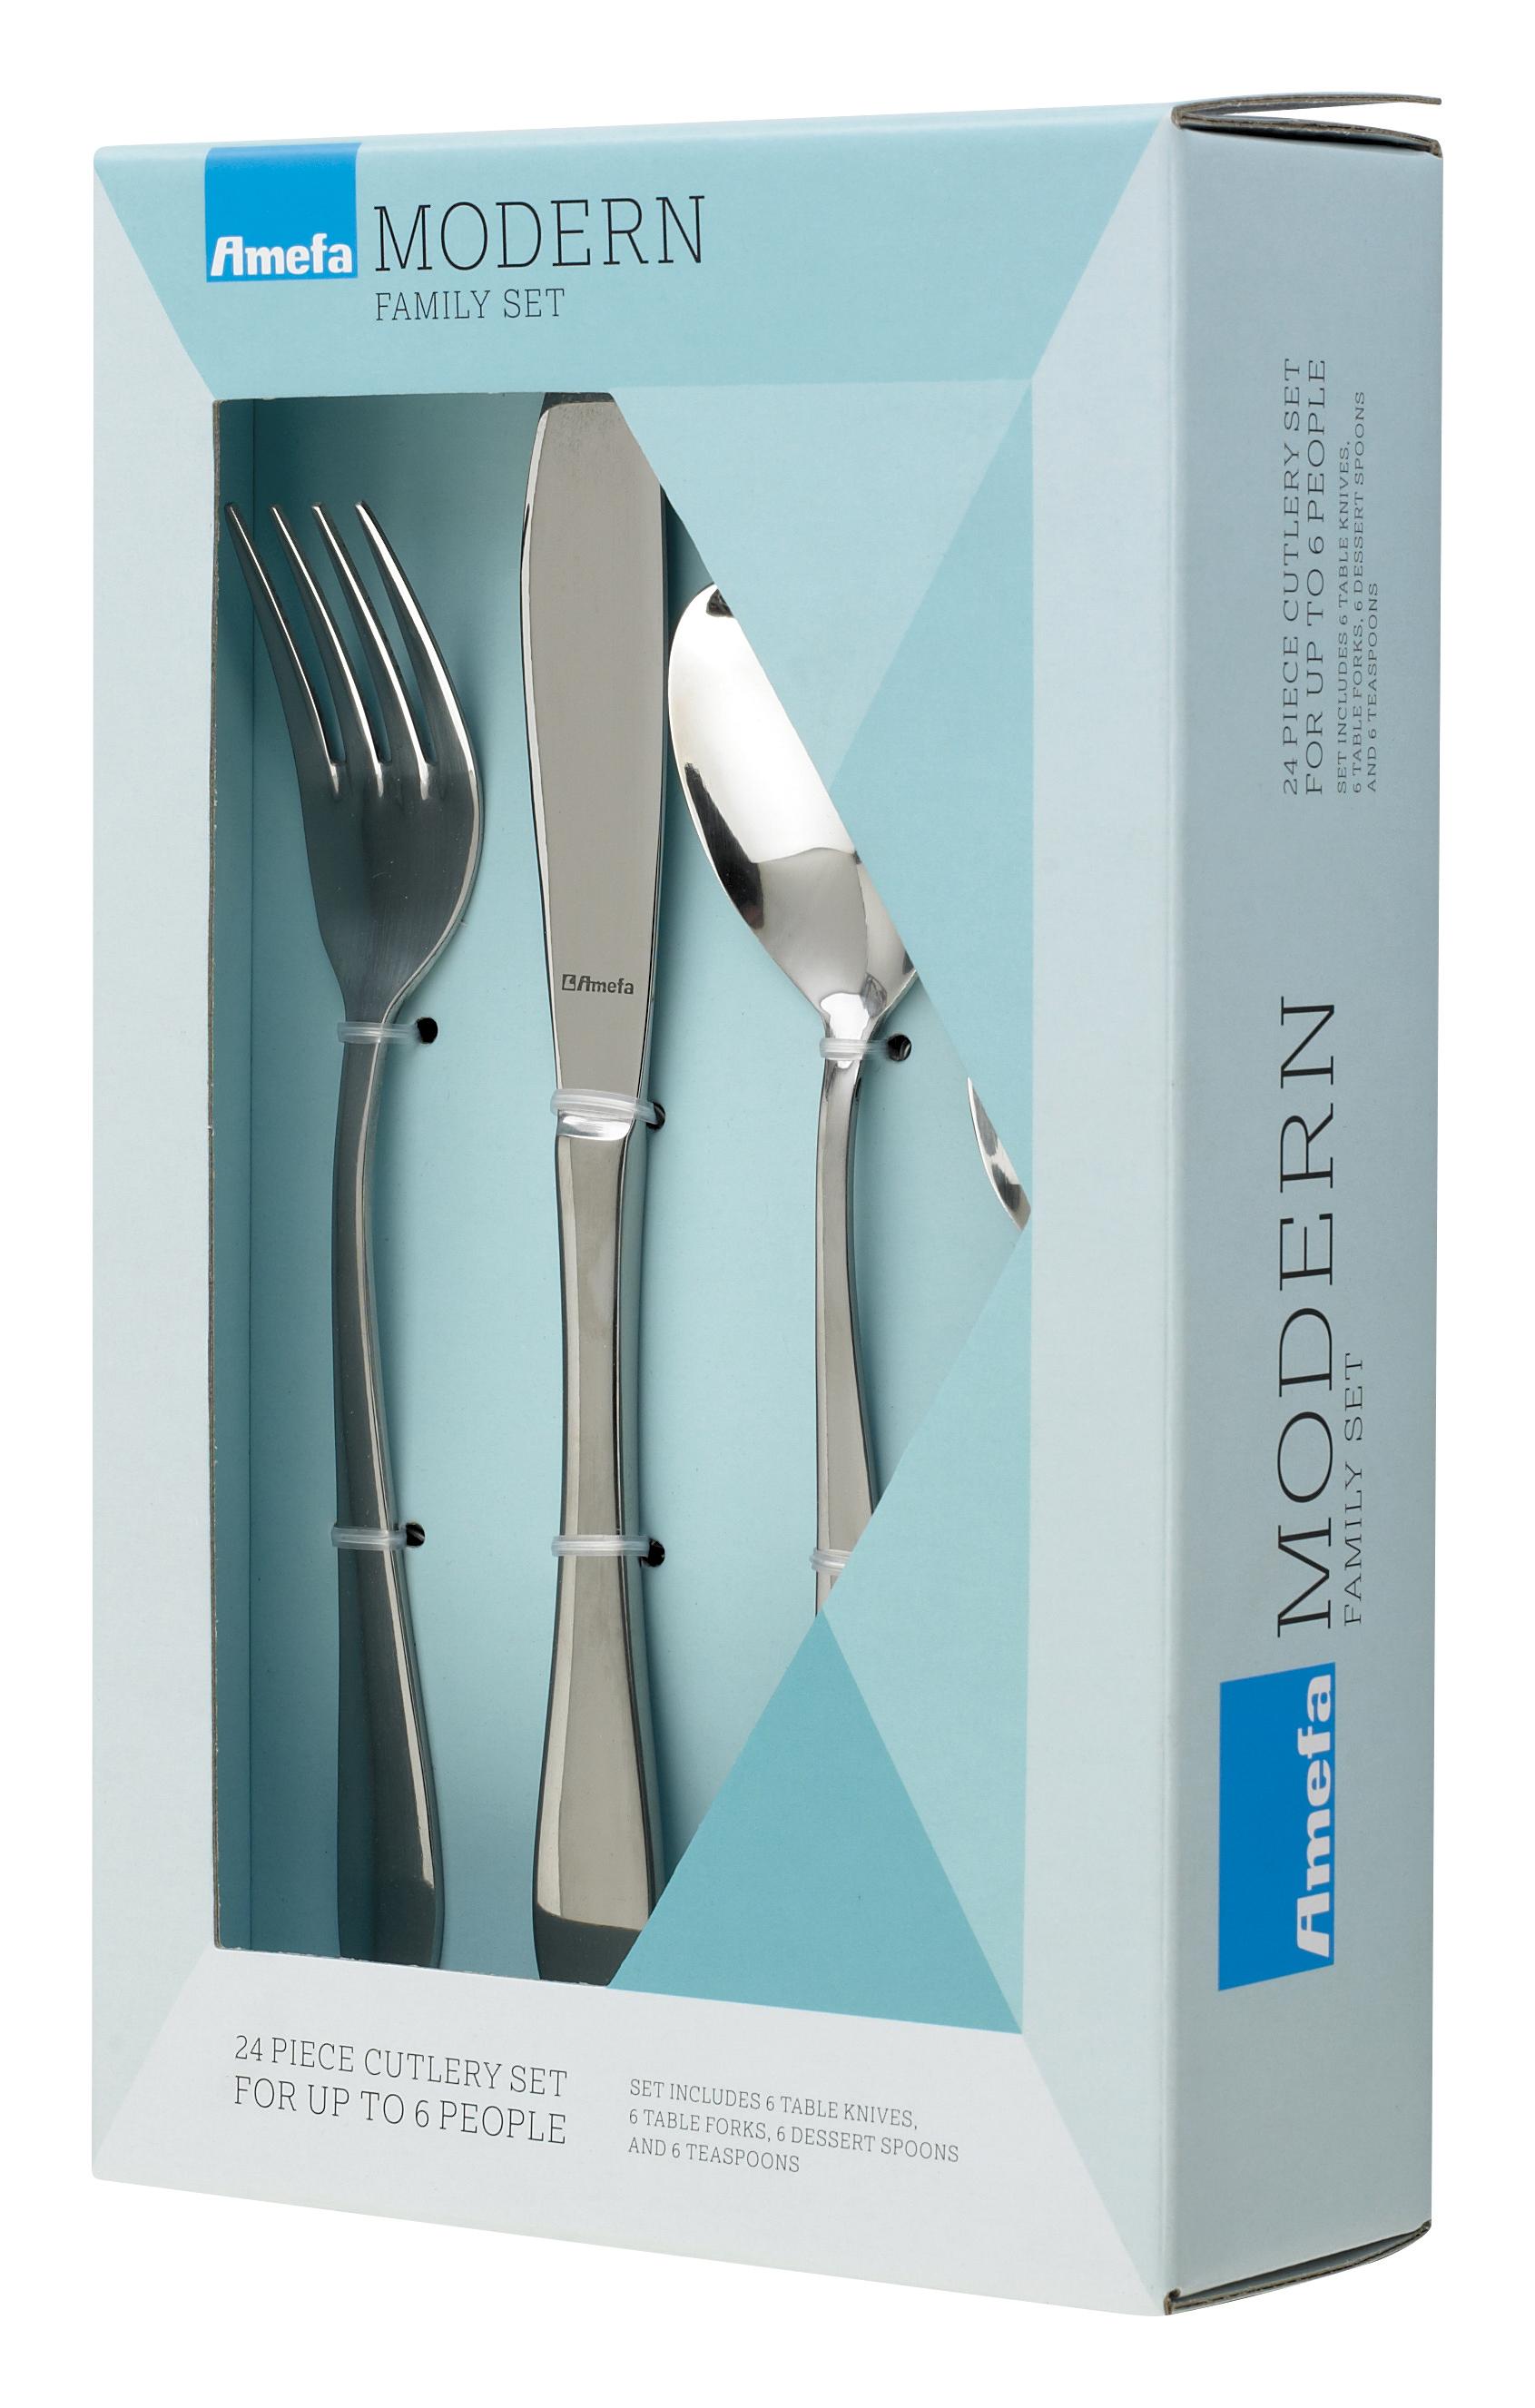 AmefaModern Sure 18/0 CutlerySet 24pcs